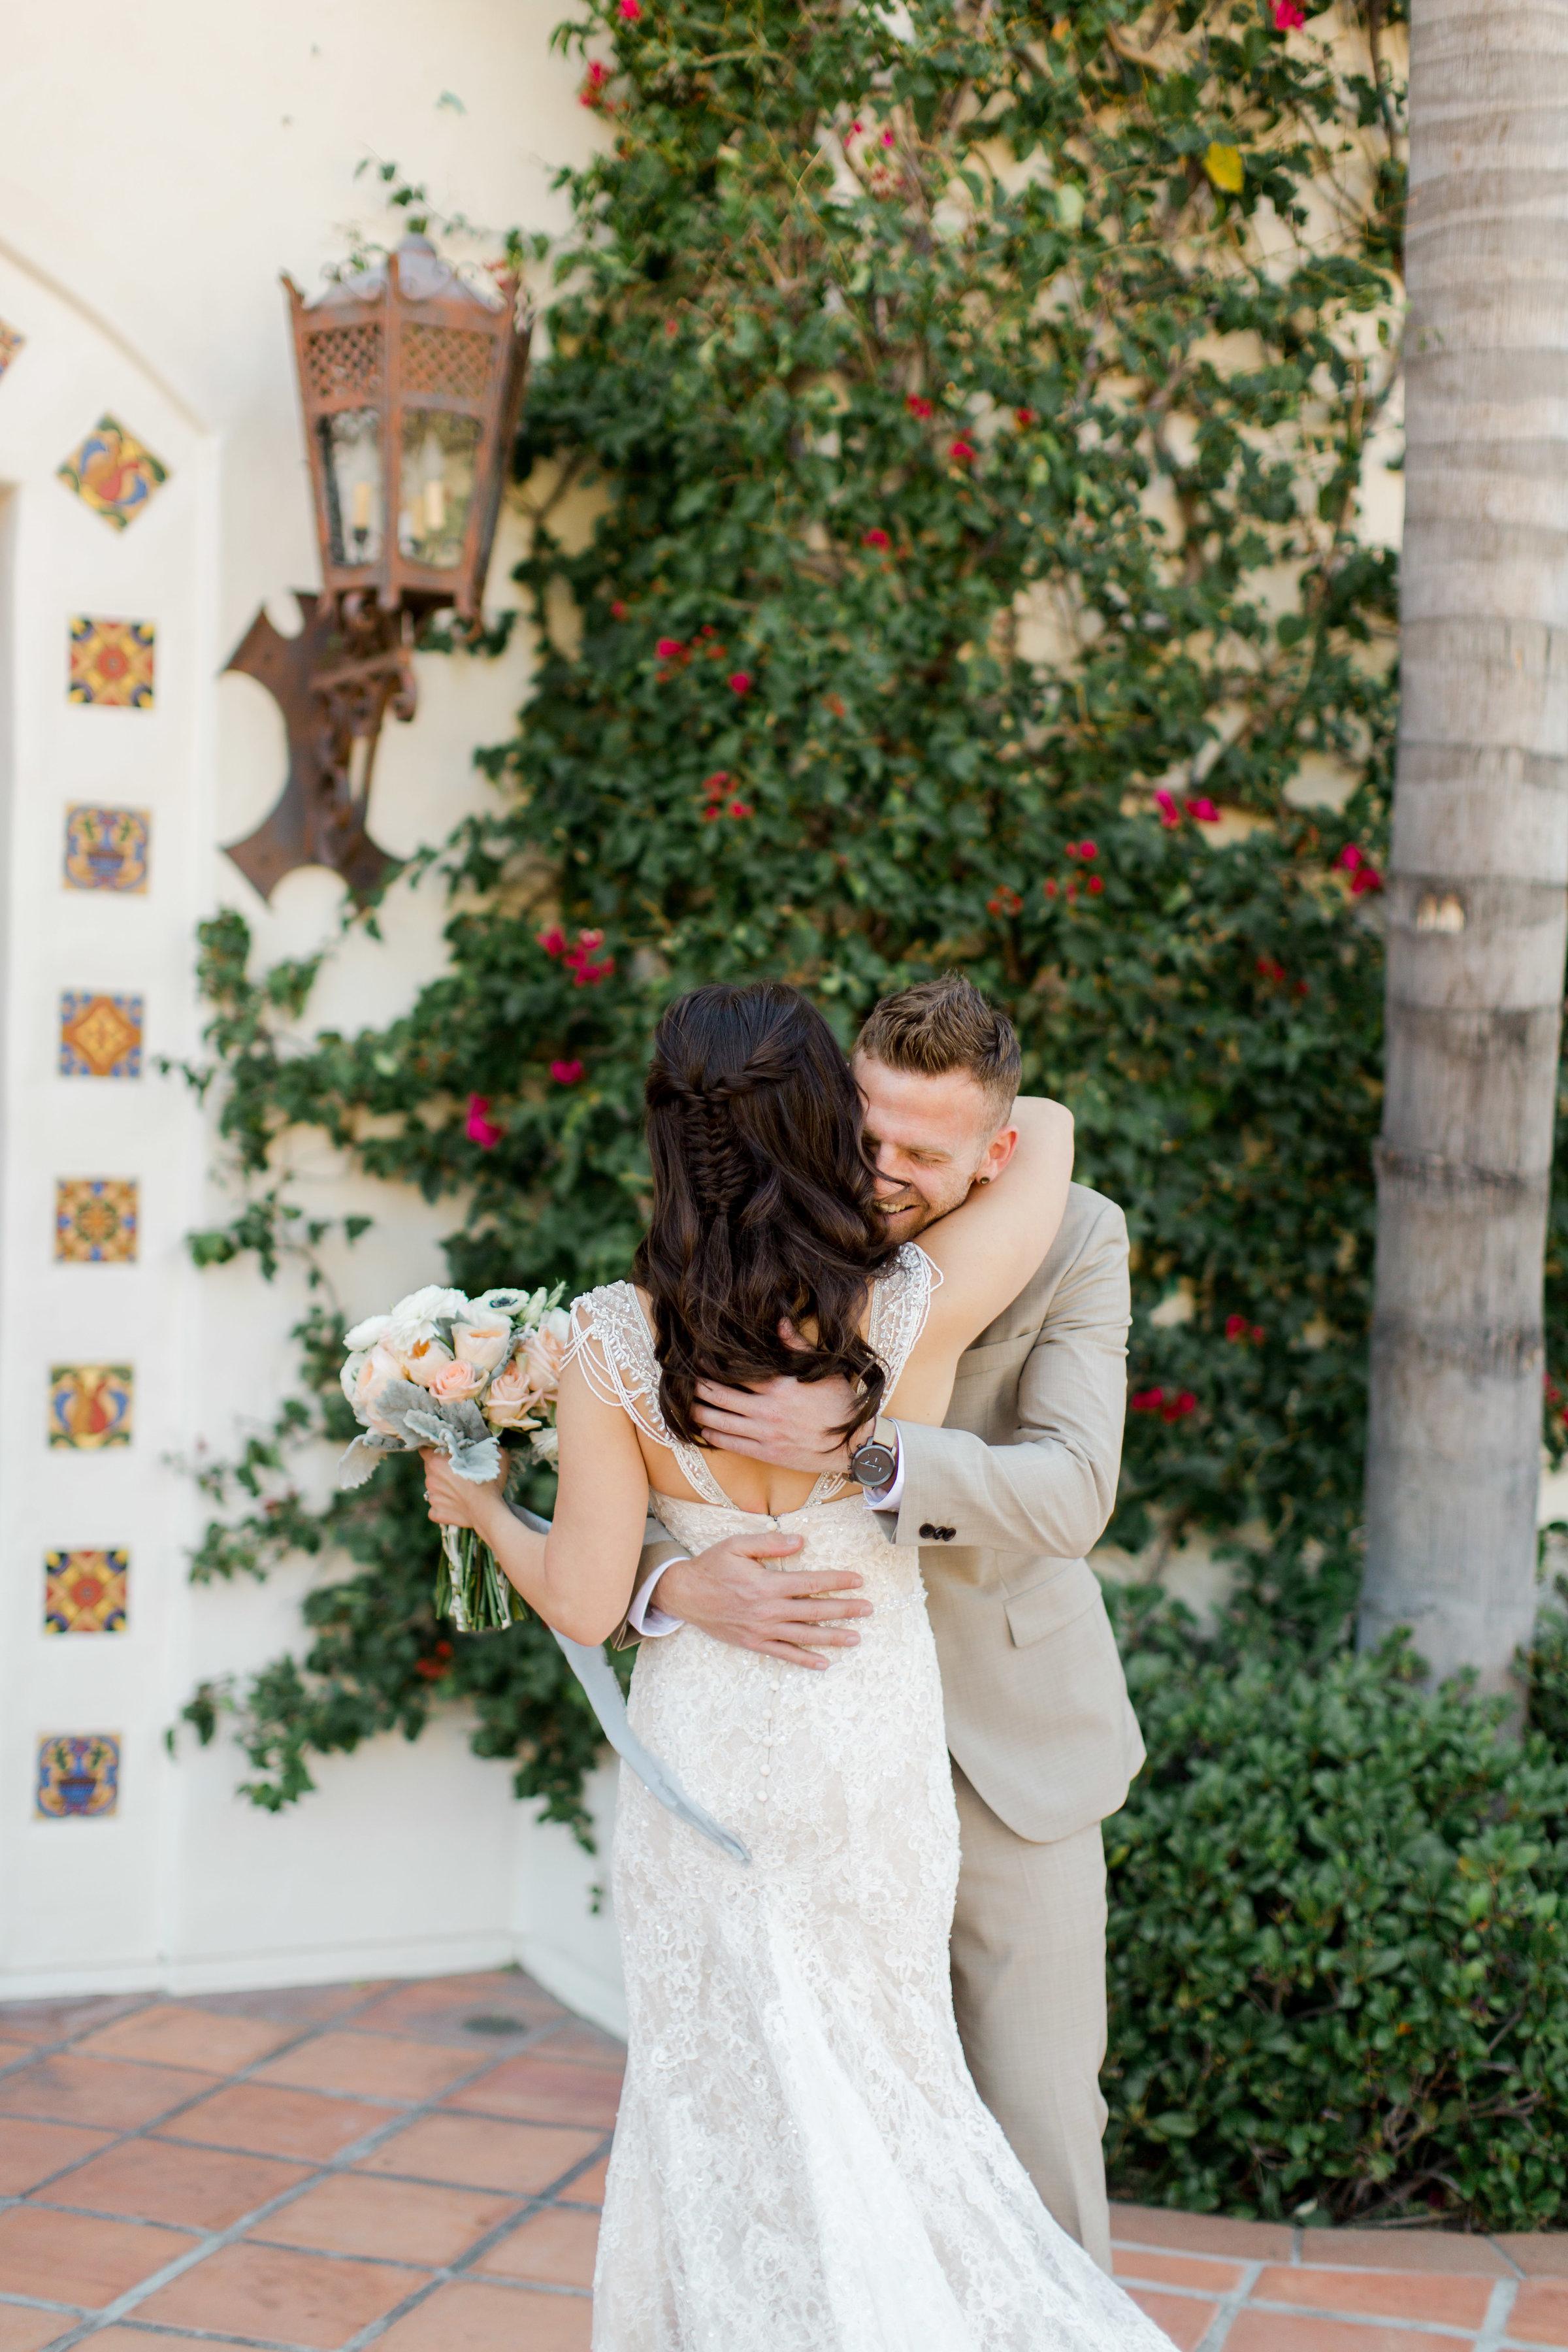 JennyQuicksallPhotography_www.jennyquicksall.com_HummingbirdNestRanchWedding_-118.jpg